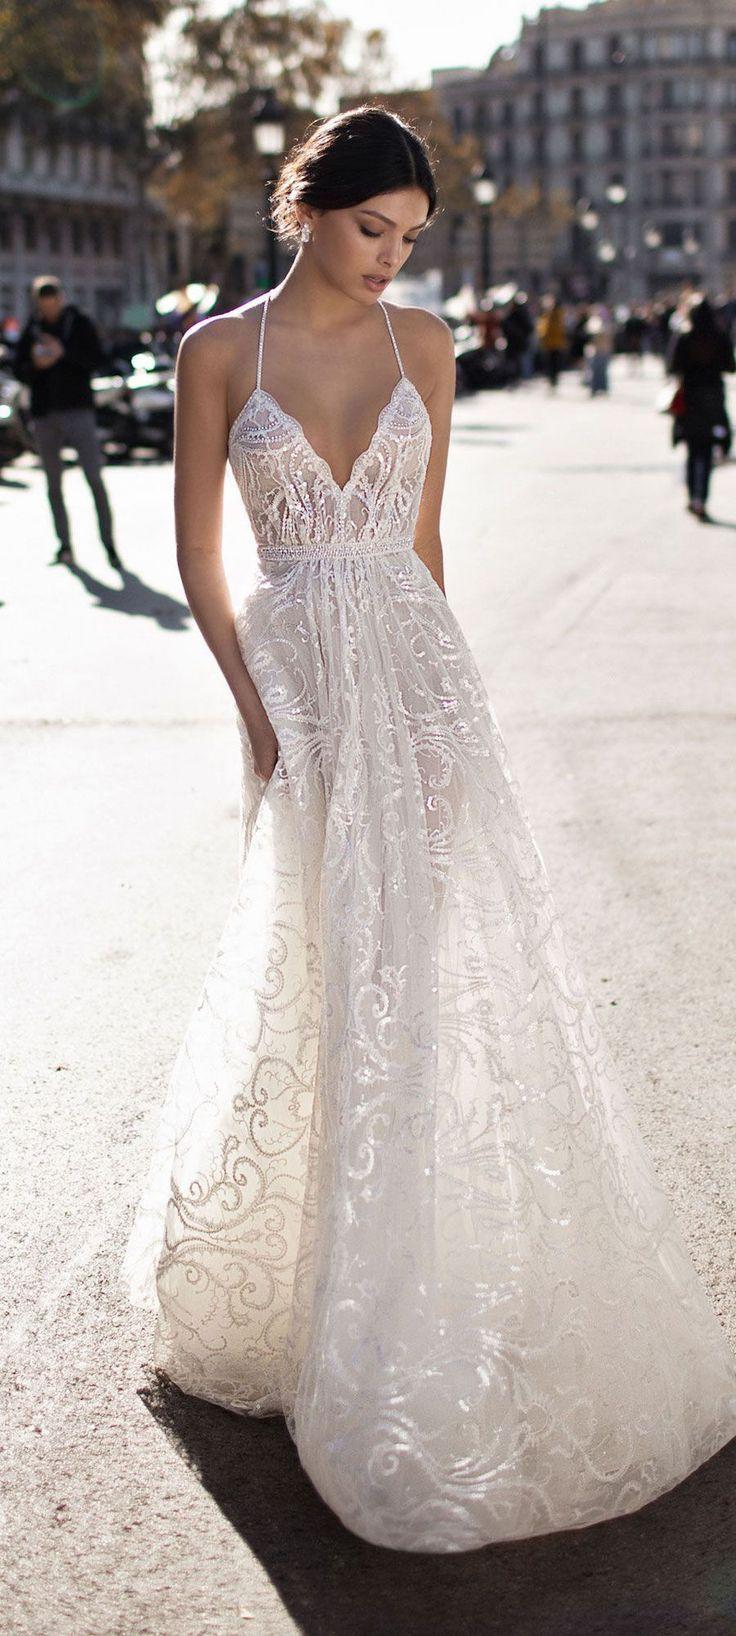 306 best Brautkleider images on Pinterest | Wedding outfits, Bridal ...